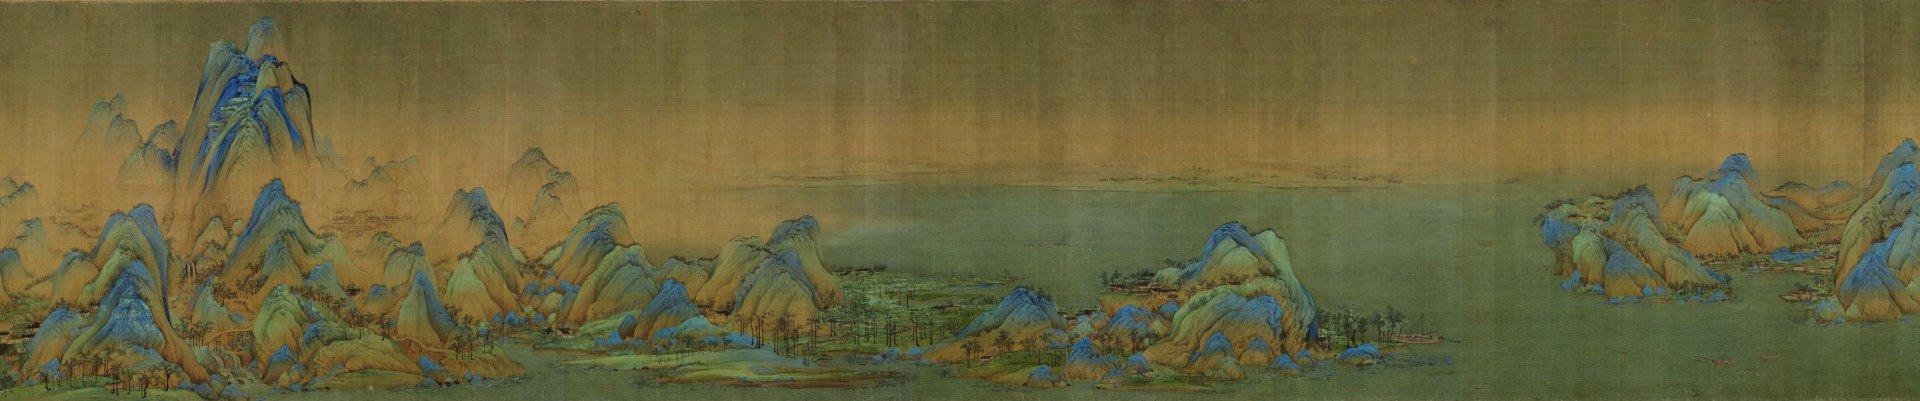 3.t1c_Wang_Ximeng._A_Thousand_Li_of_Rivers_and_Mountains..jpg